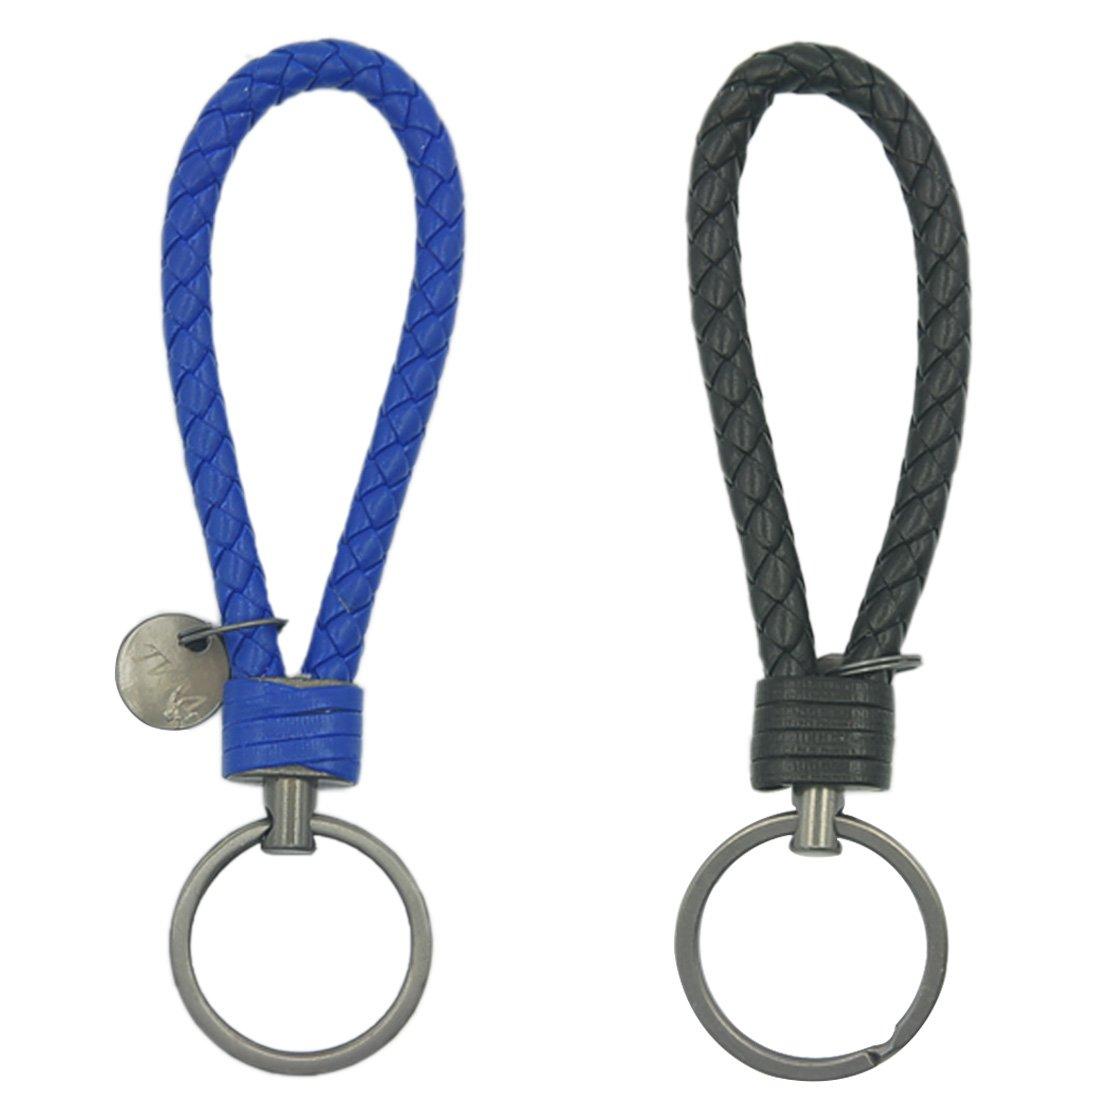 Office Oyachic 2 Pack Braided Car Key Chain Handmade Couple Key Ring Loop Home